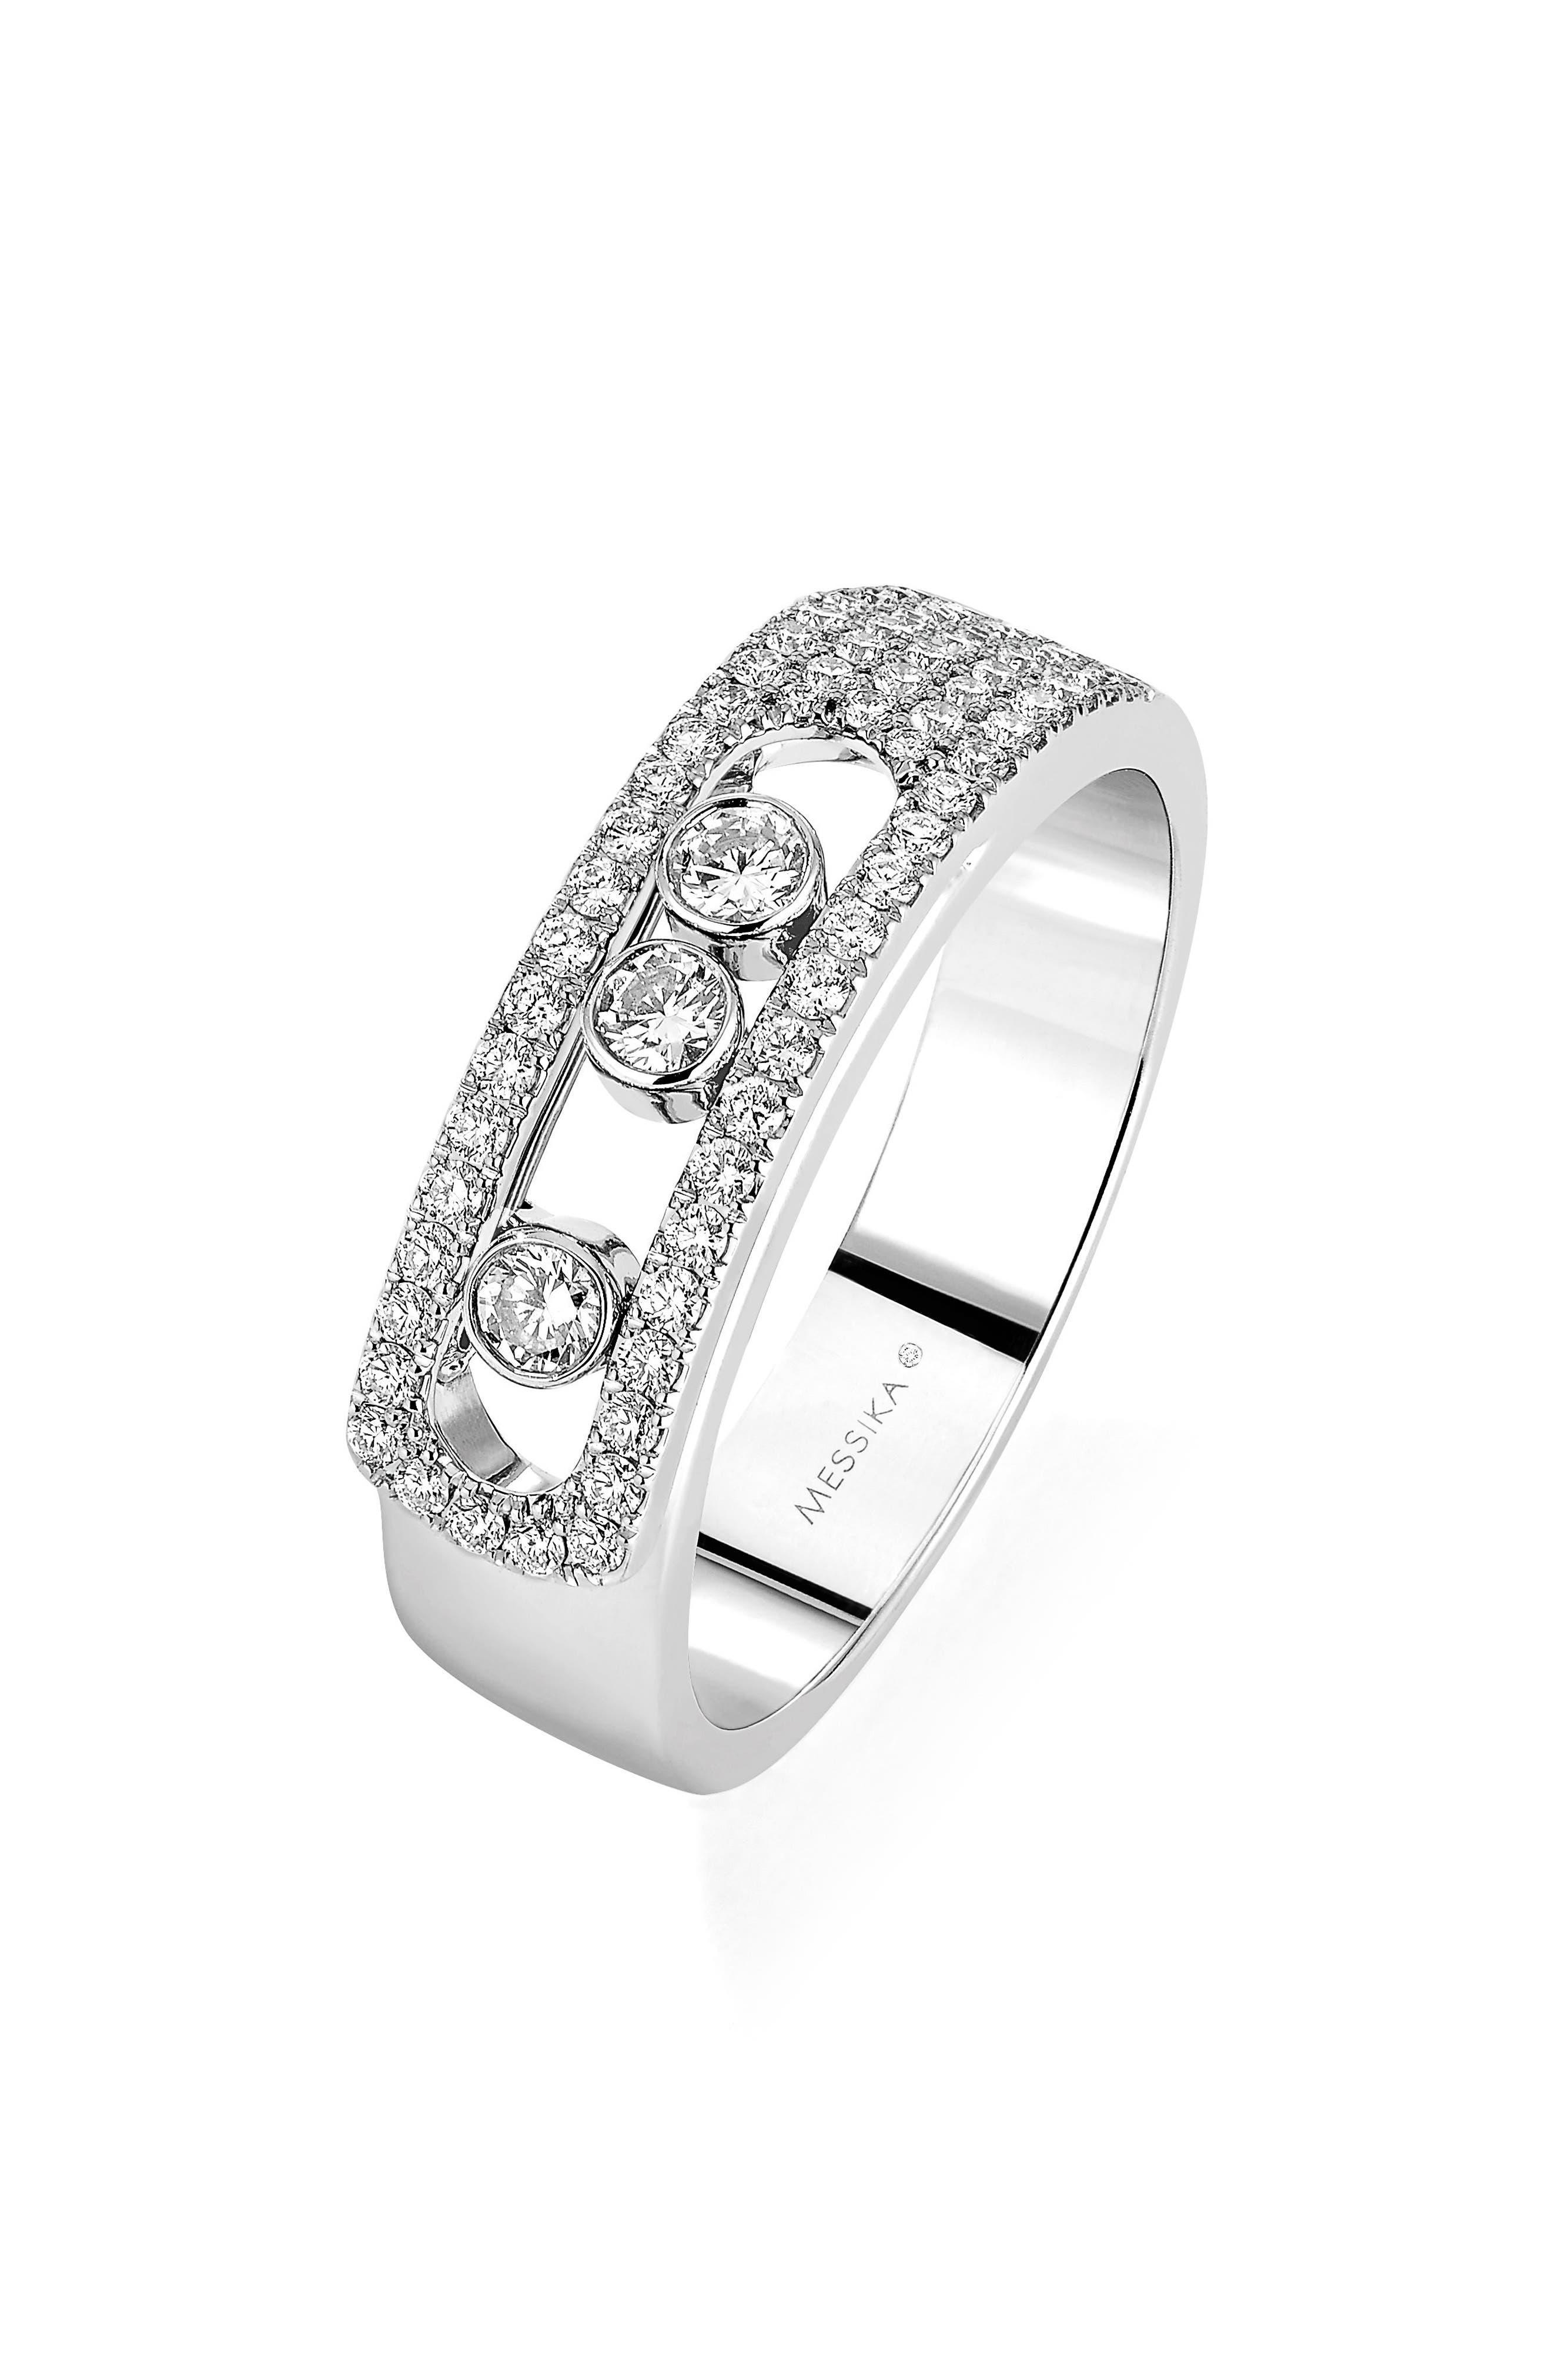 Messika Move Noa Diamond Ring